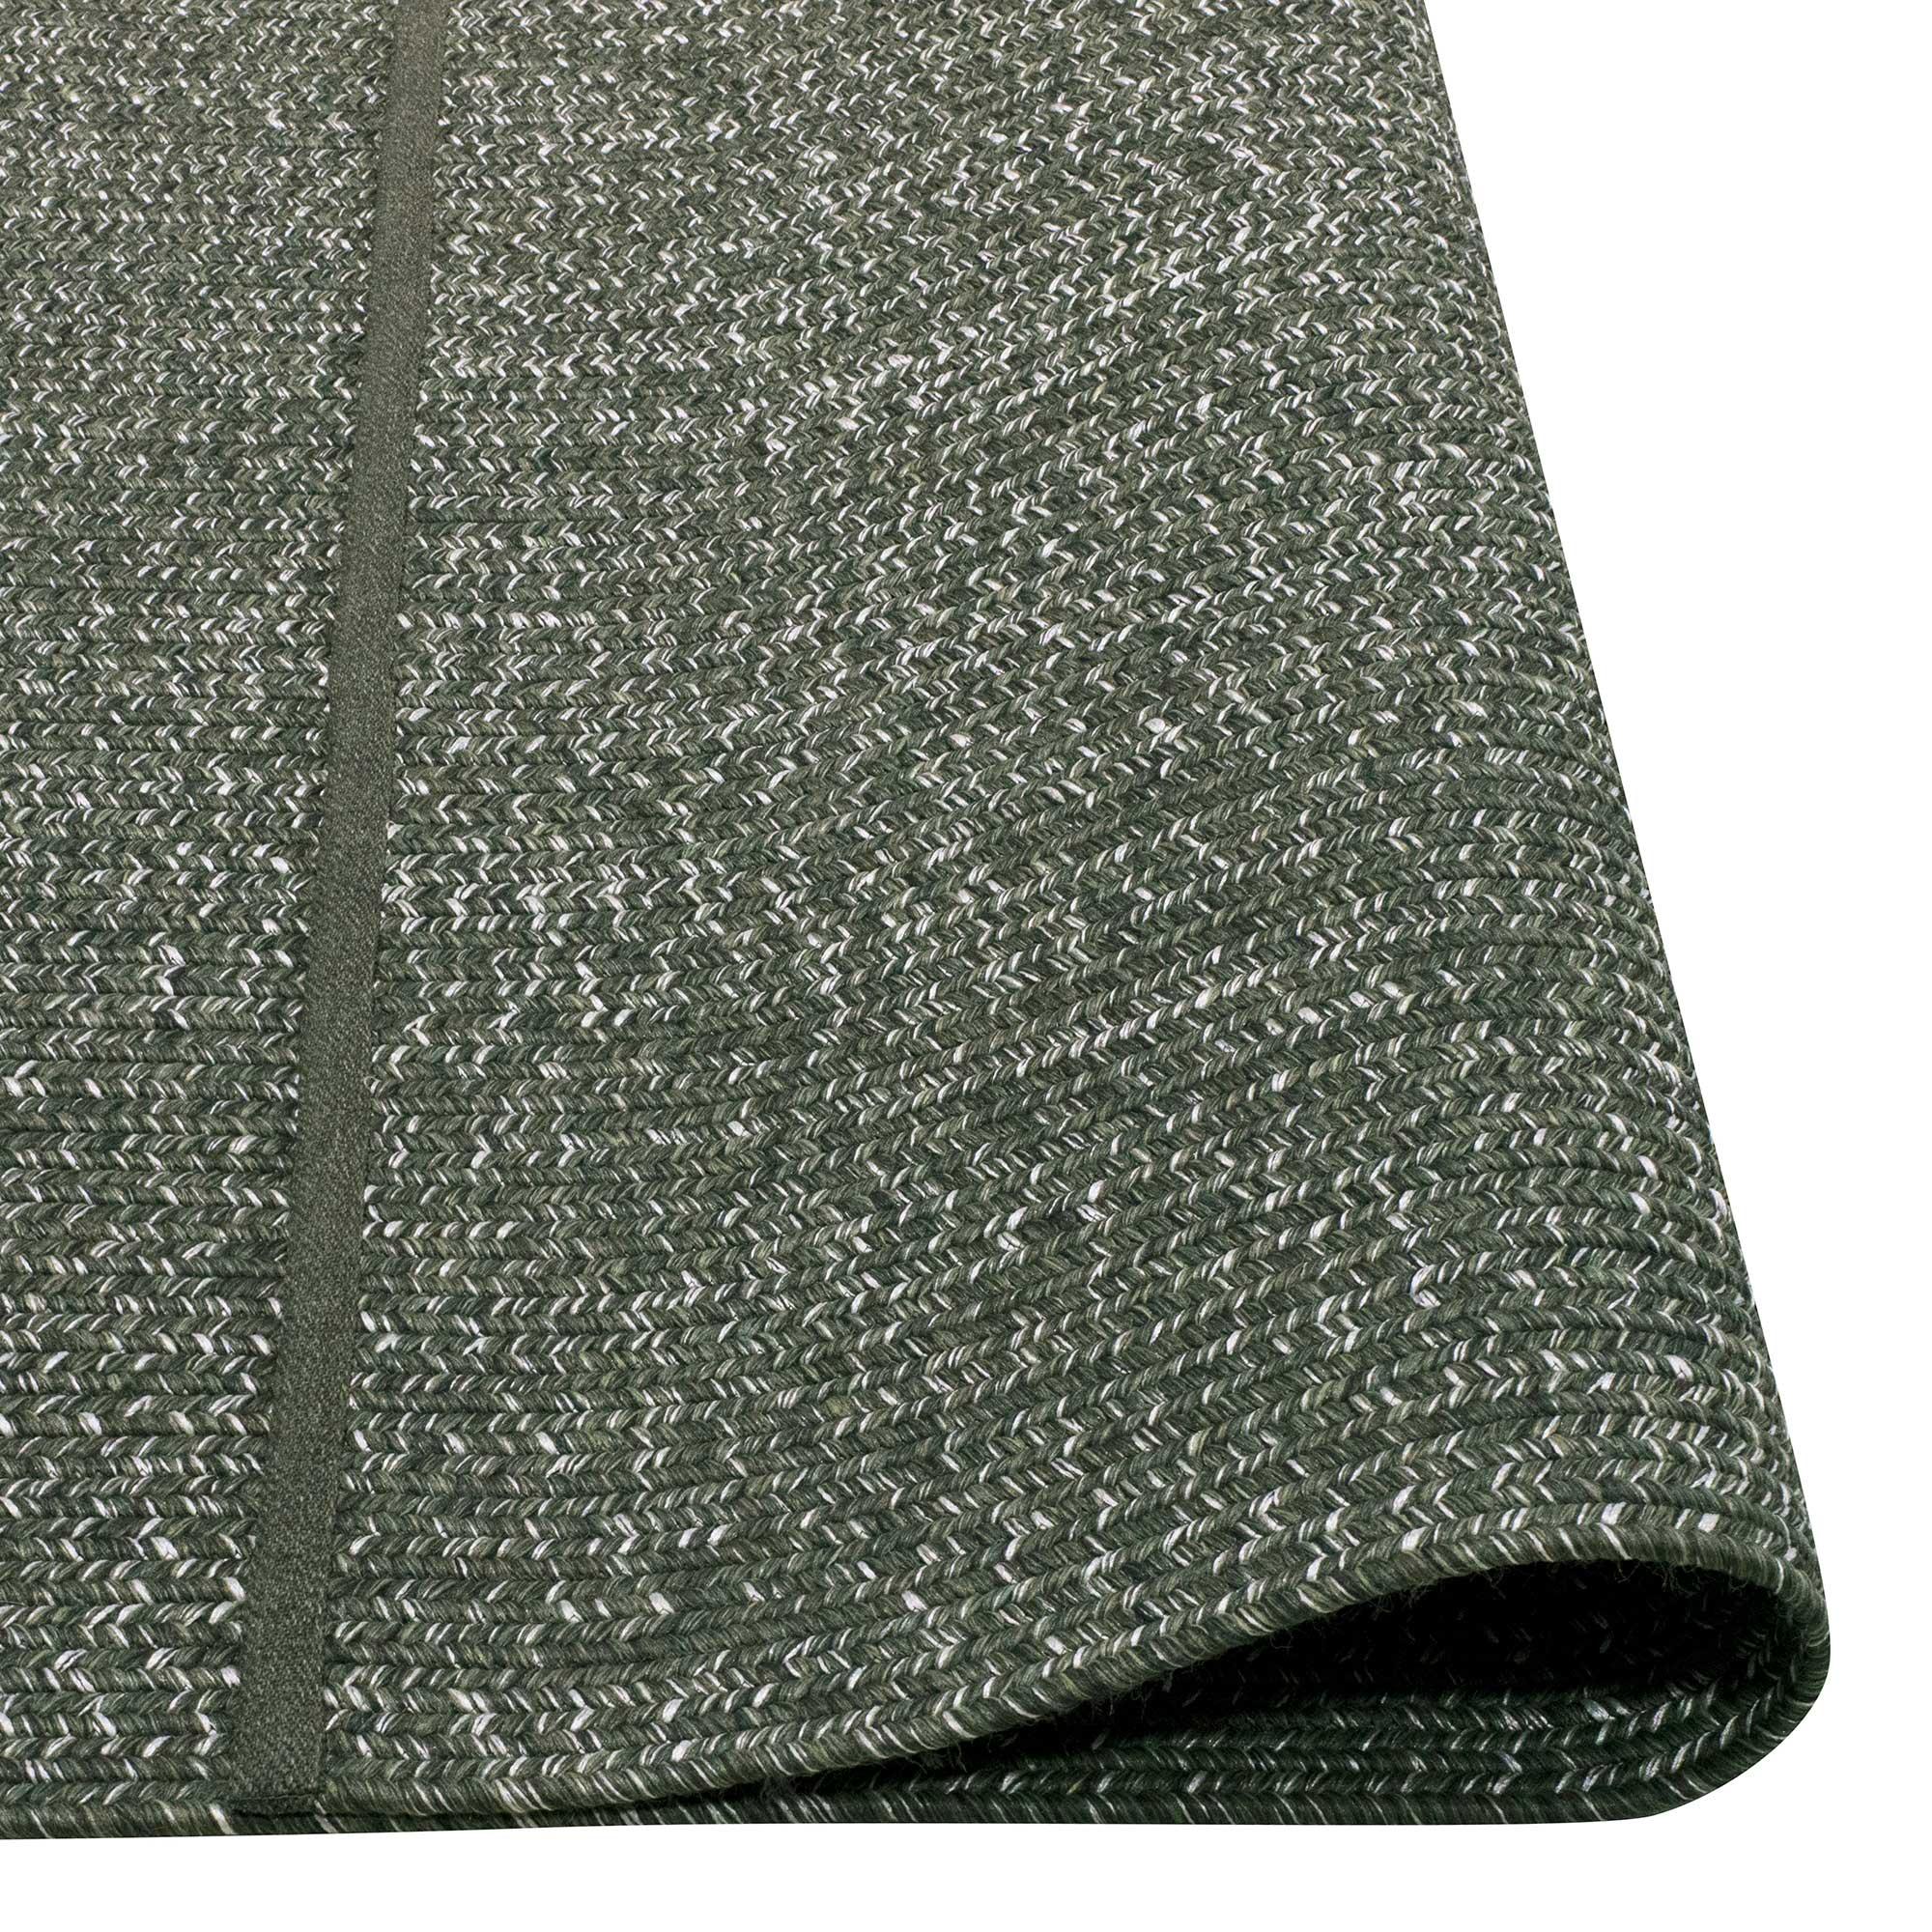 Seasons_Stripes_Khaki-foldback